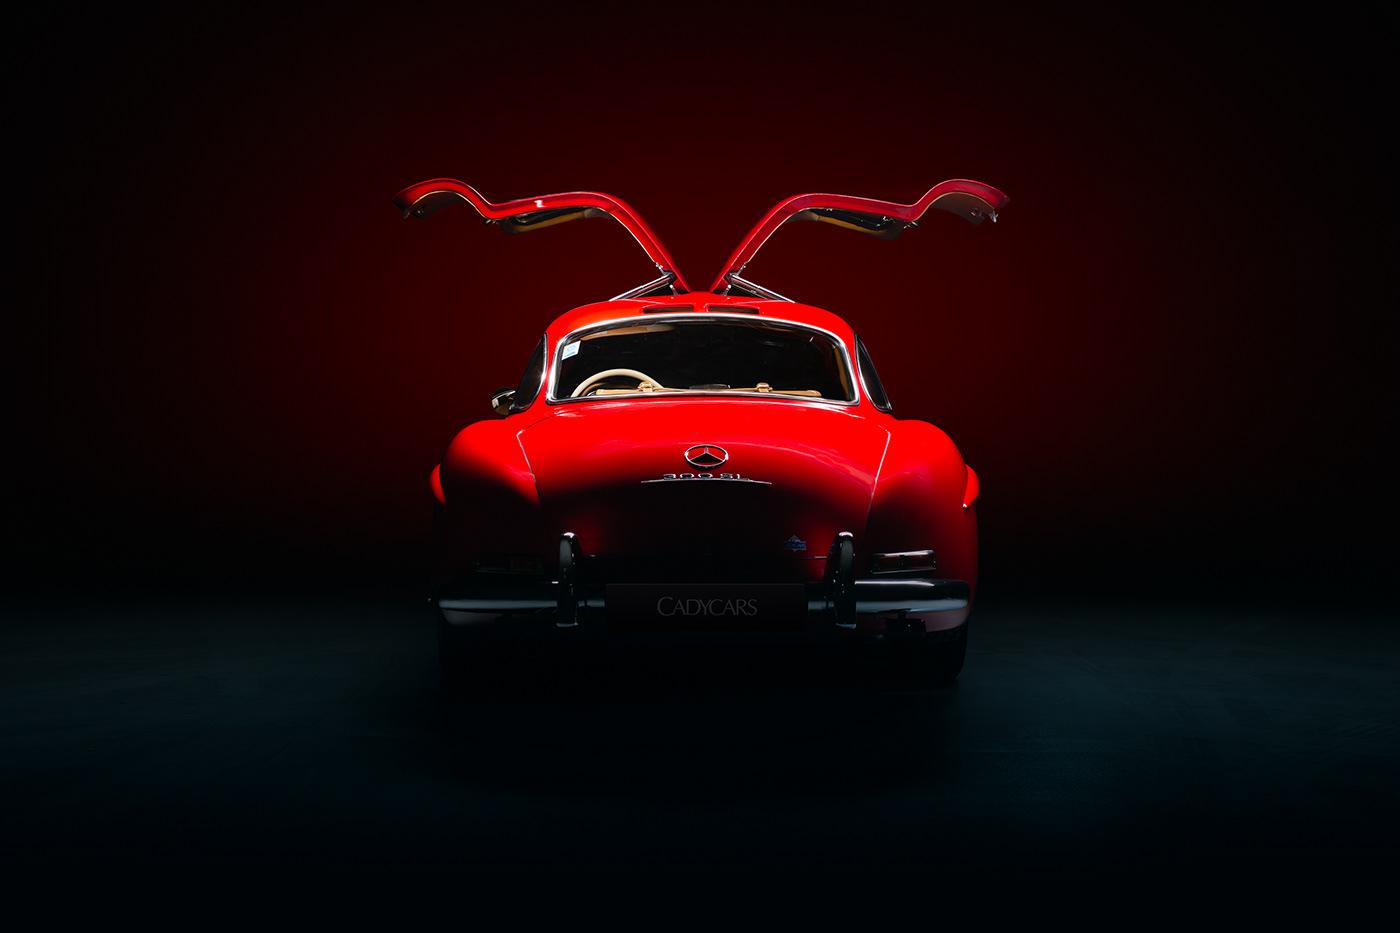 automotive   Automotive Photography car car photography commercial mercedes-benz Moody red Retro supercar